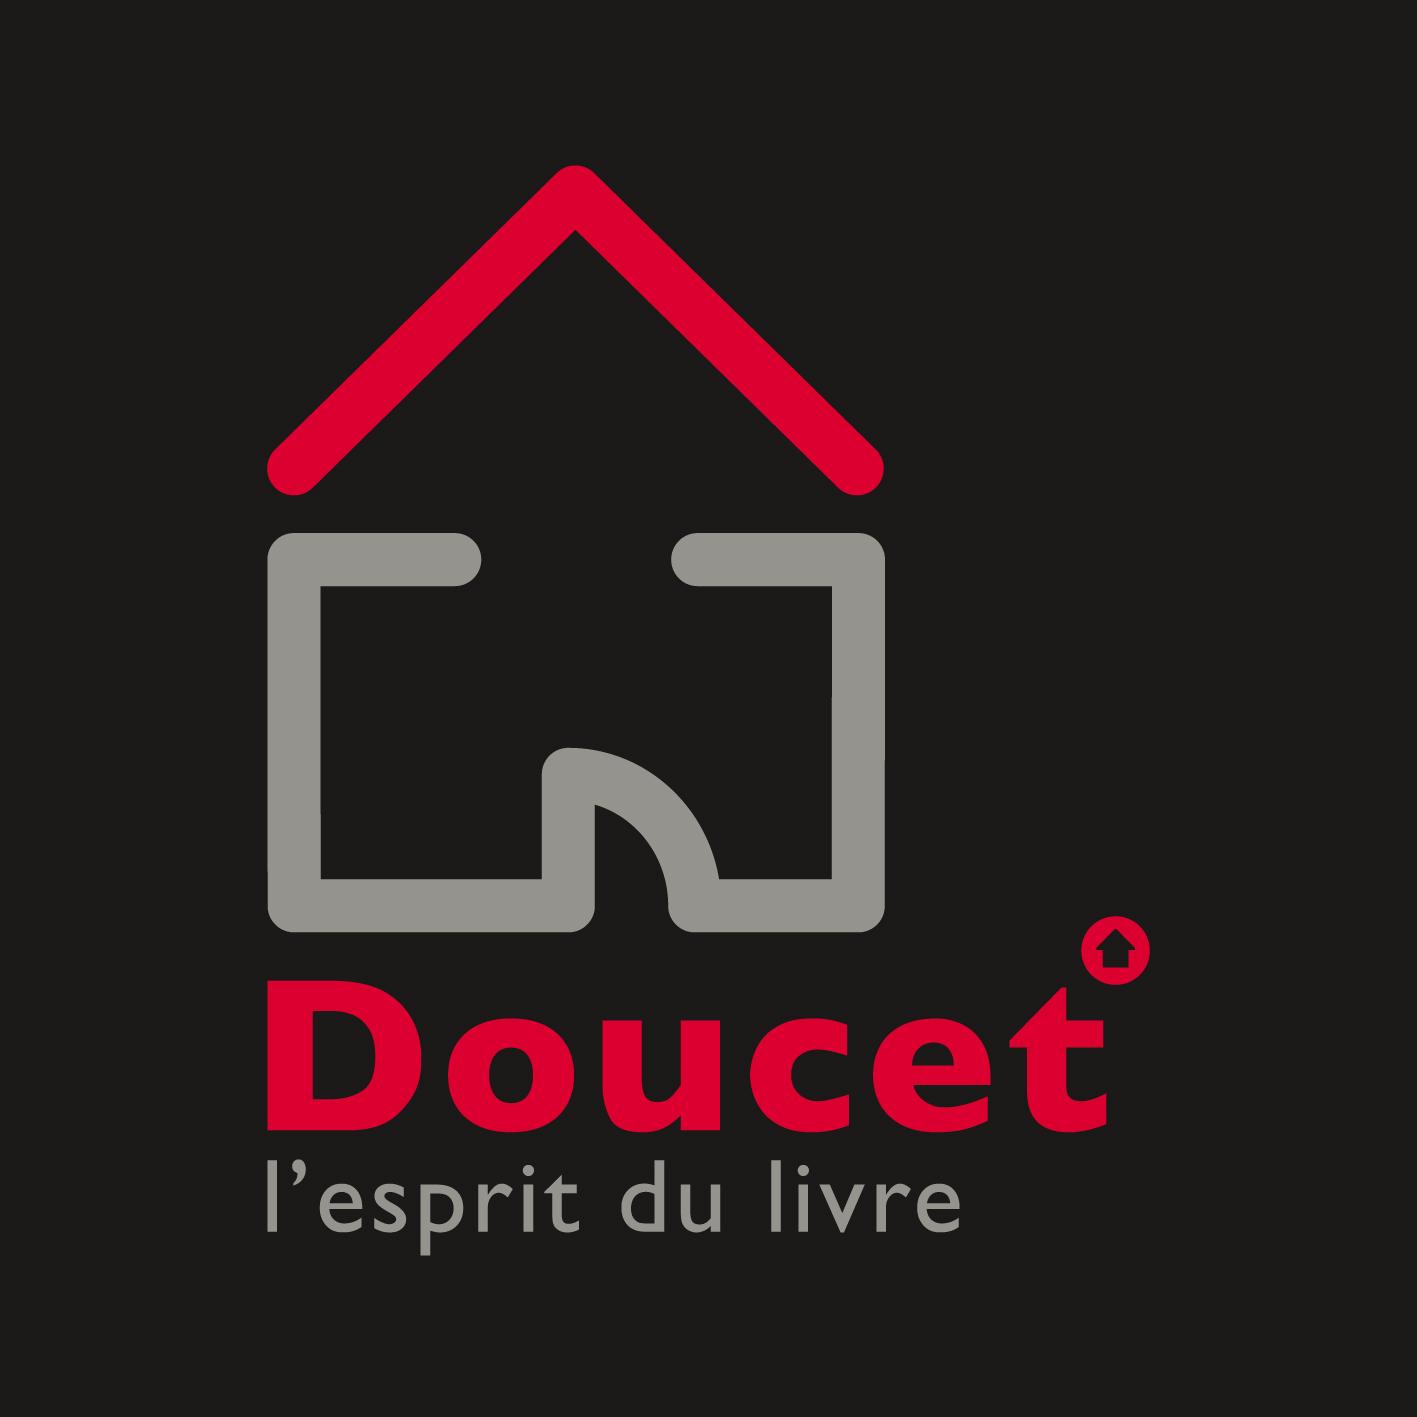 logos_Doucet_corporate_N.jpg